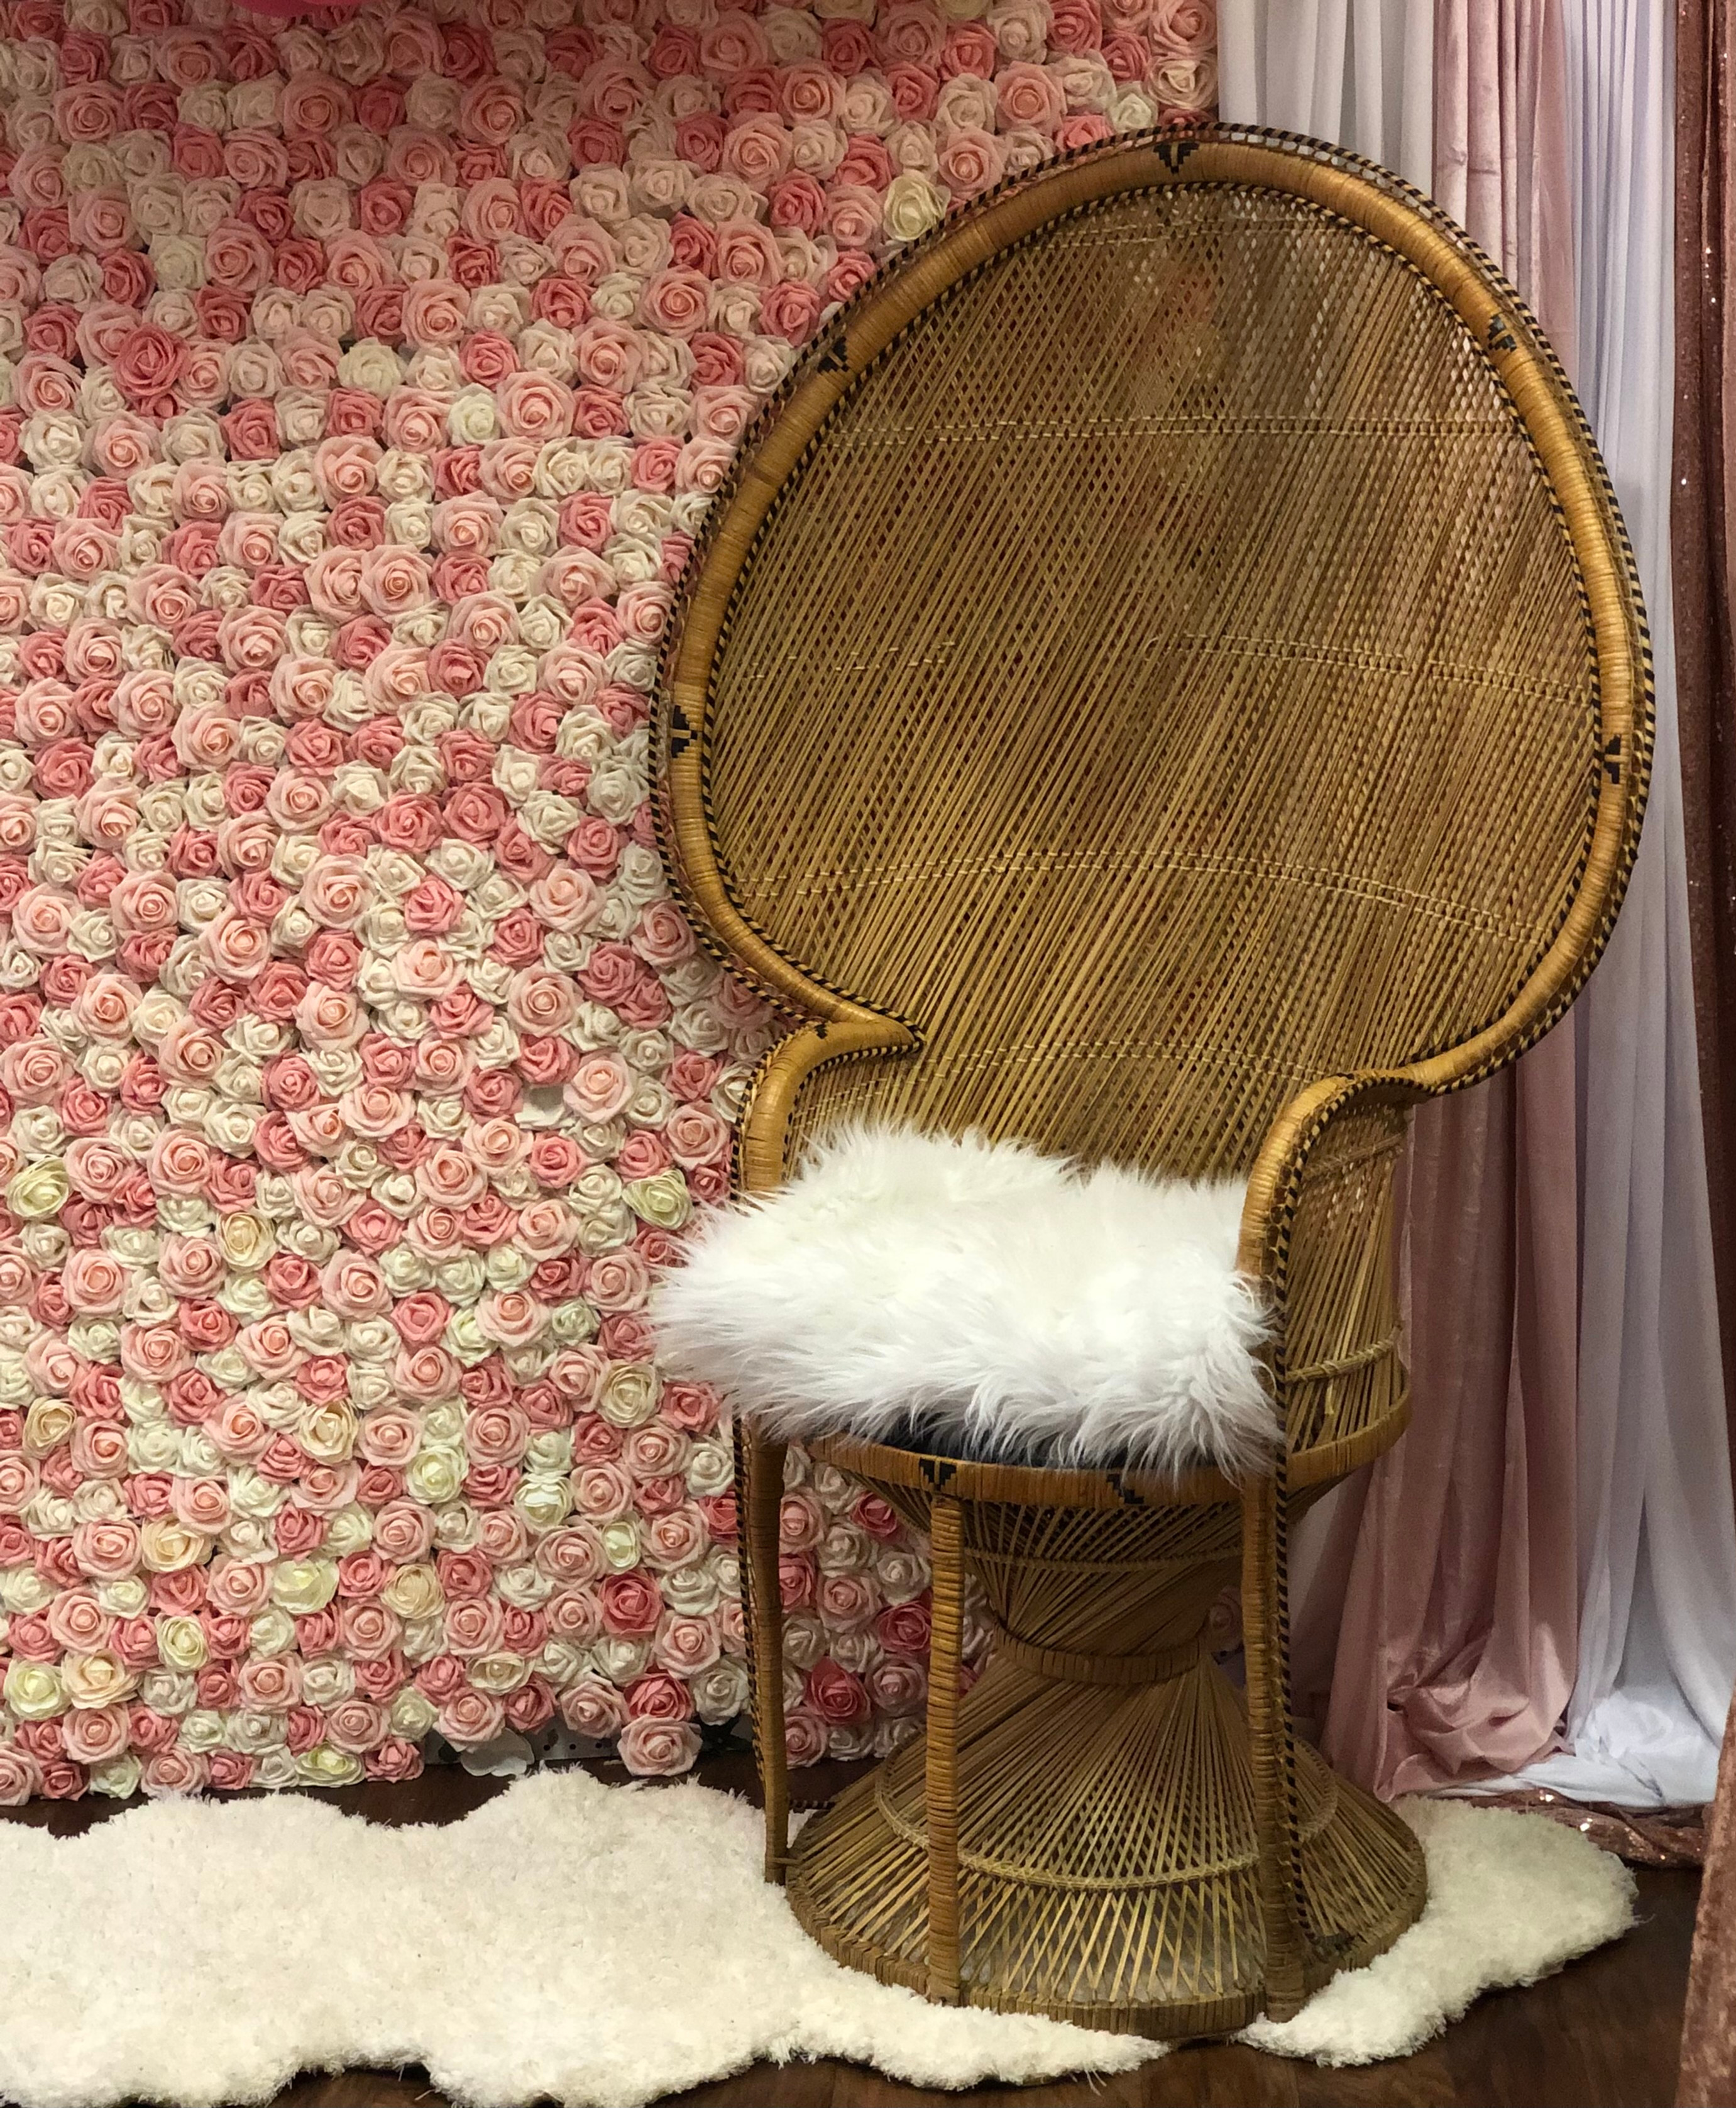 Peacock Boho Style Chair - Tall